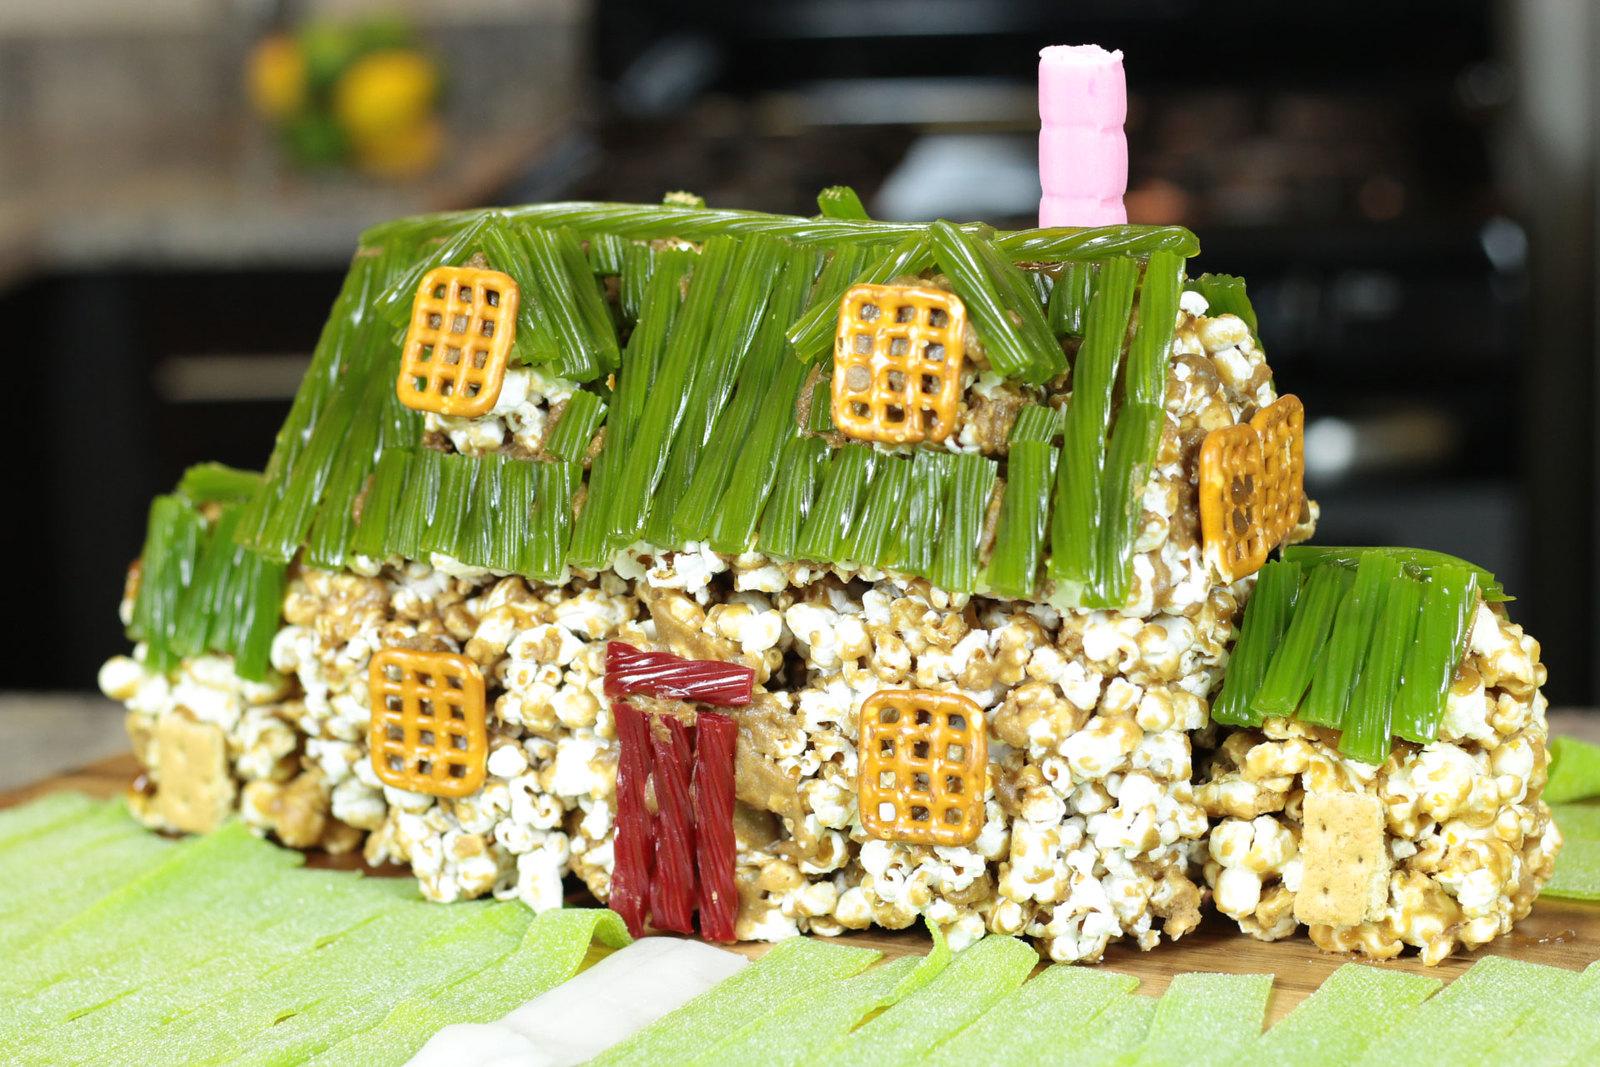 How To Make The Family Guy House Using Caramel Popcorn - Caramel Popcorn Food Art For Kids Tutorial